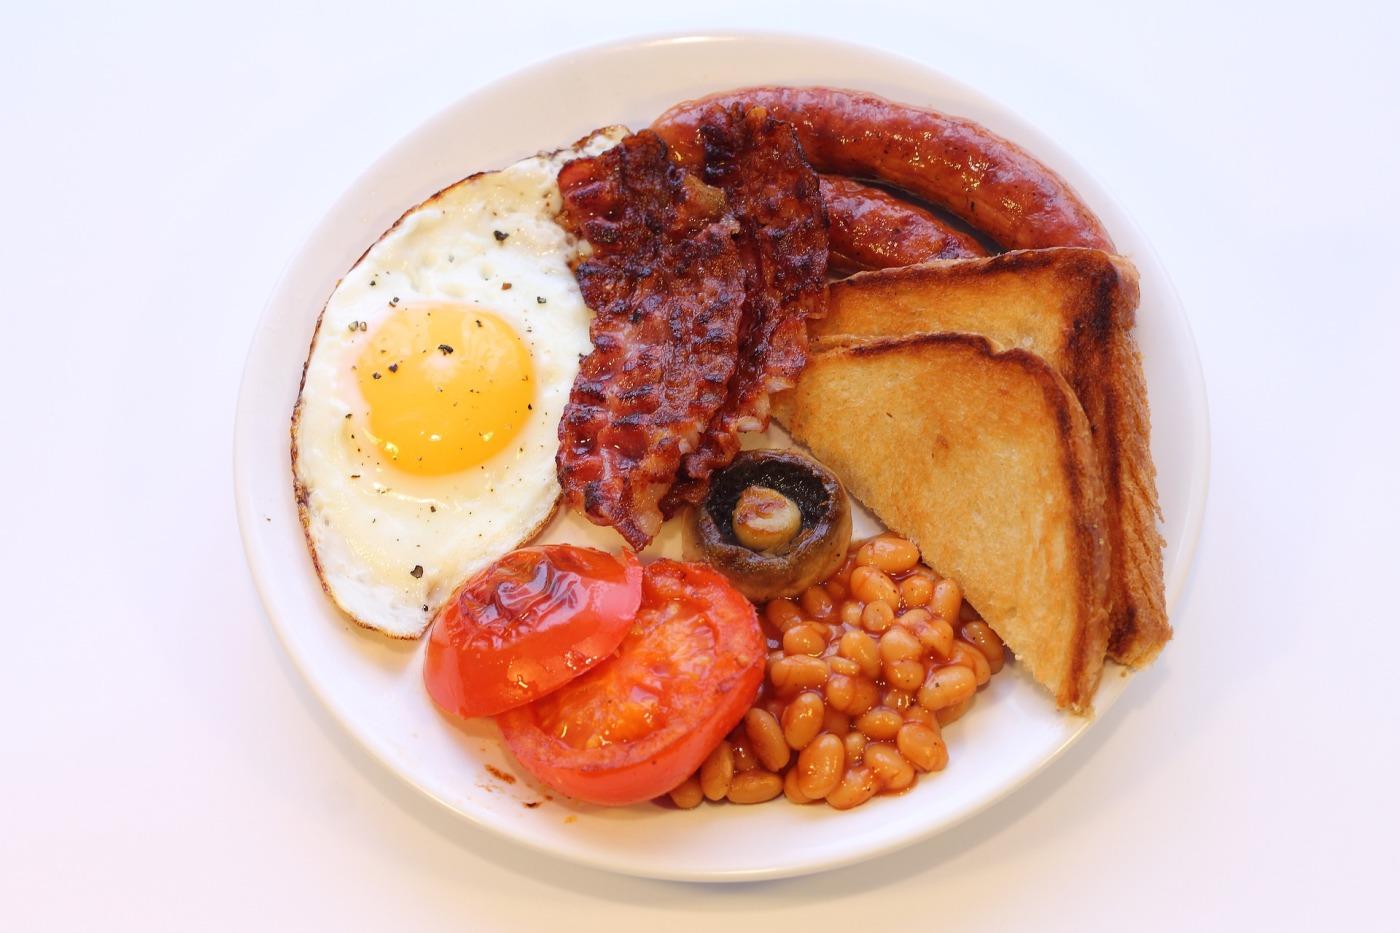 english-breakfast-2053889_1920.jpg